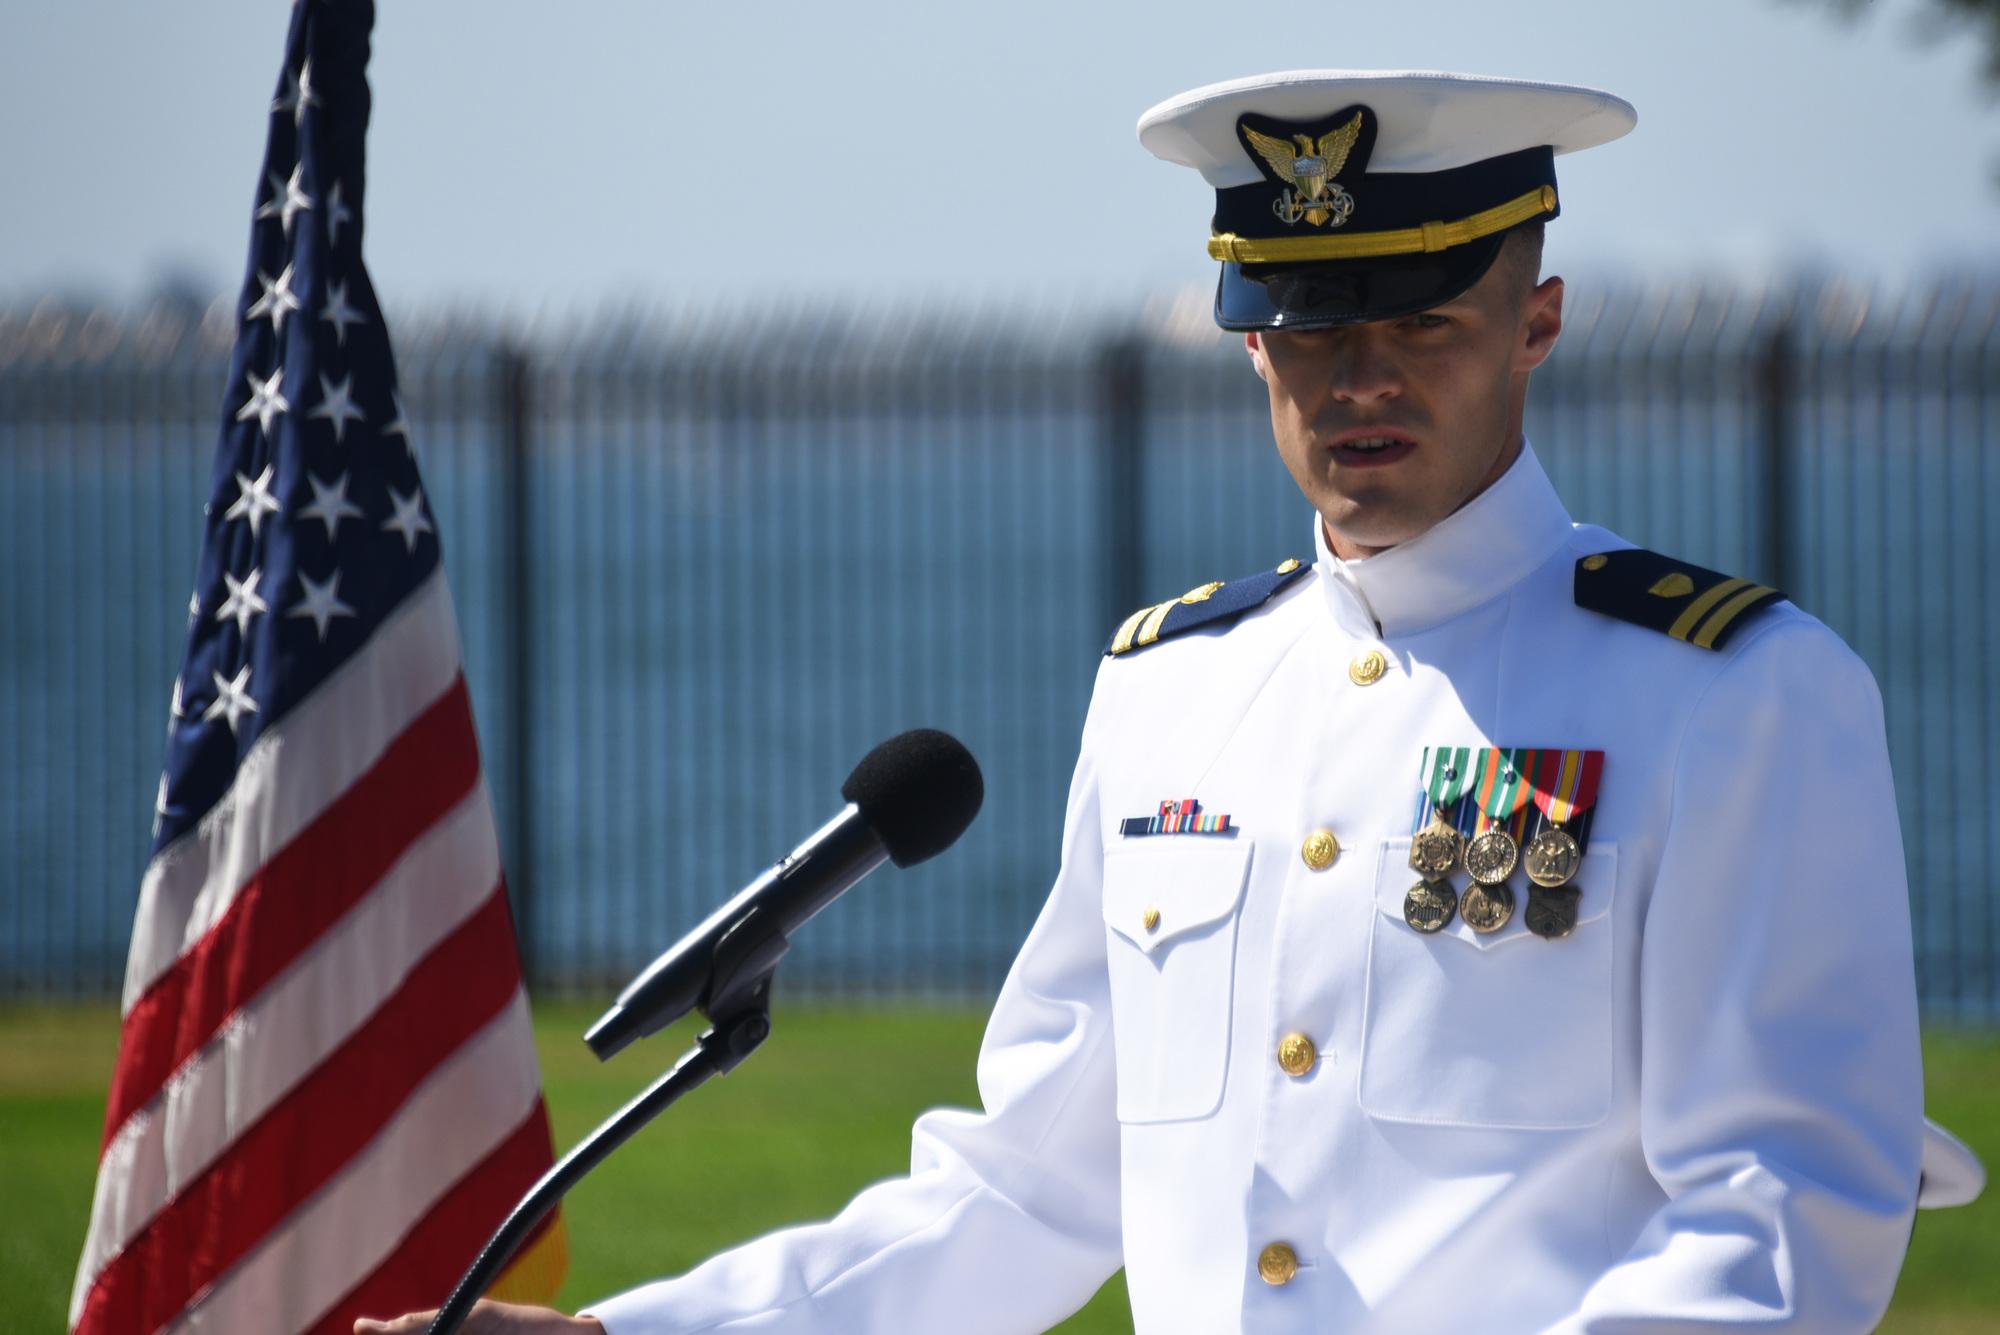 Coast Guard Cutter Haddock Change of Command